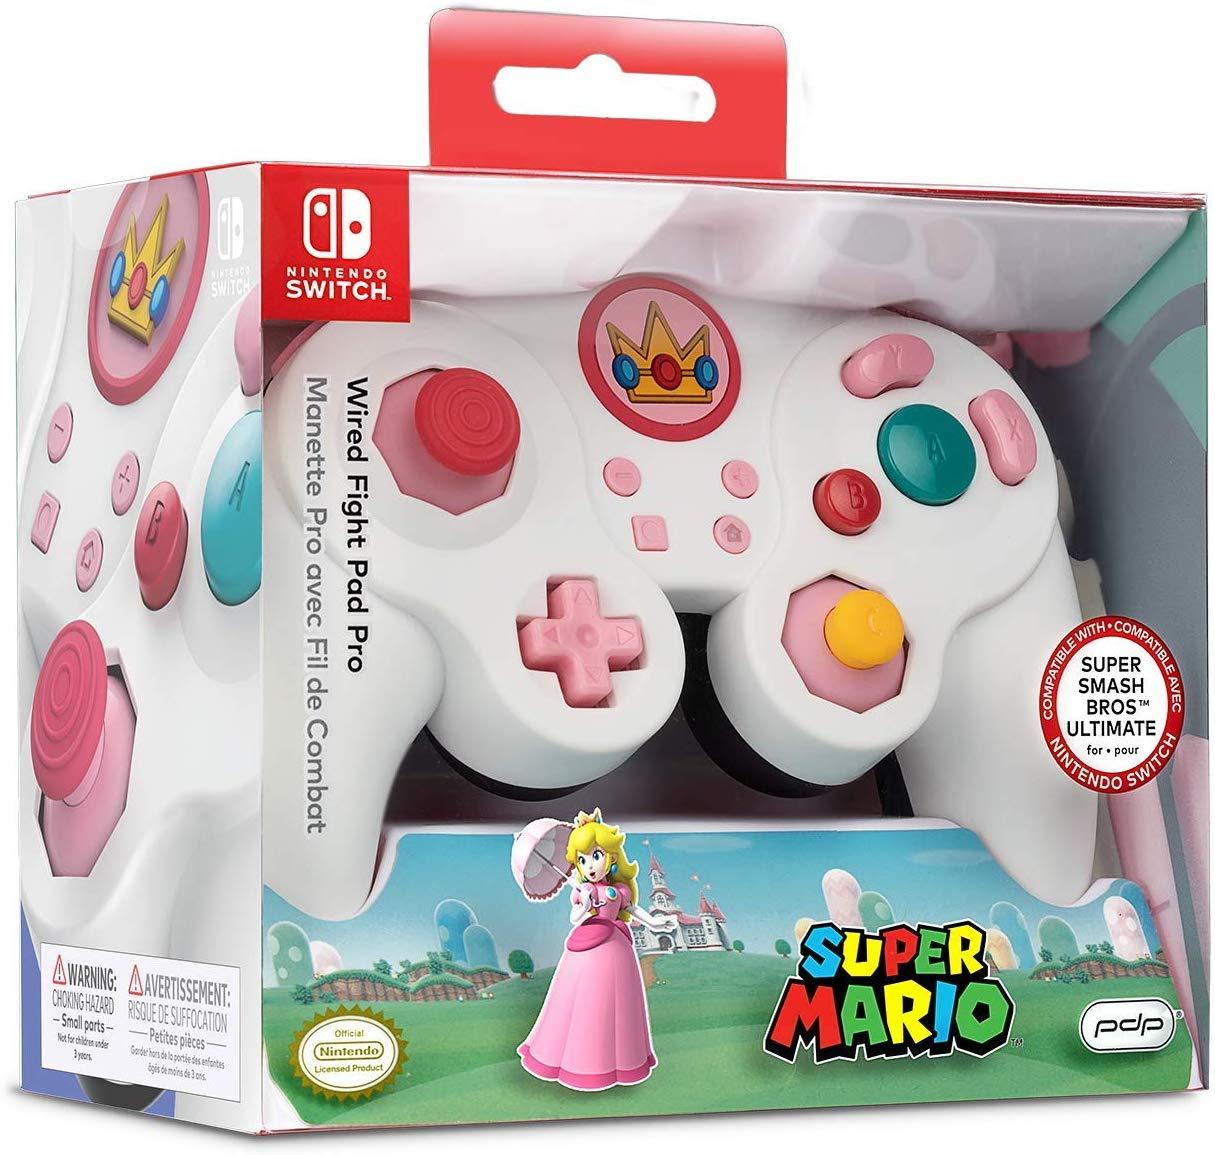 PDP Smash Fight Pad Pro Wired Controller - Peach (Nintendo Switch) £18.71 (Prime) £23.30 (Non Prime) @ Amazon